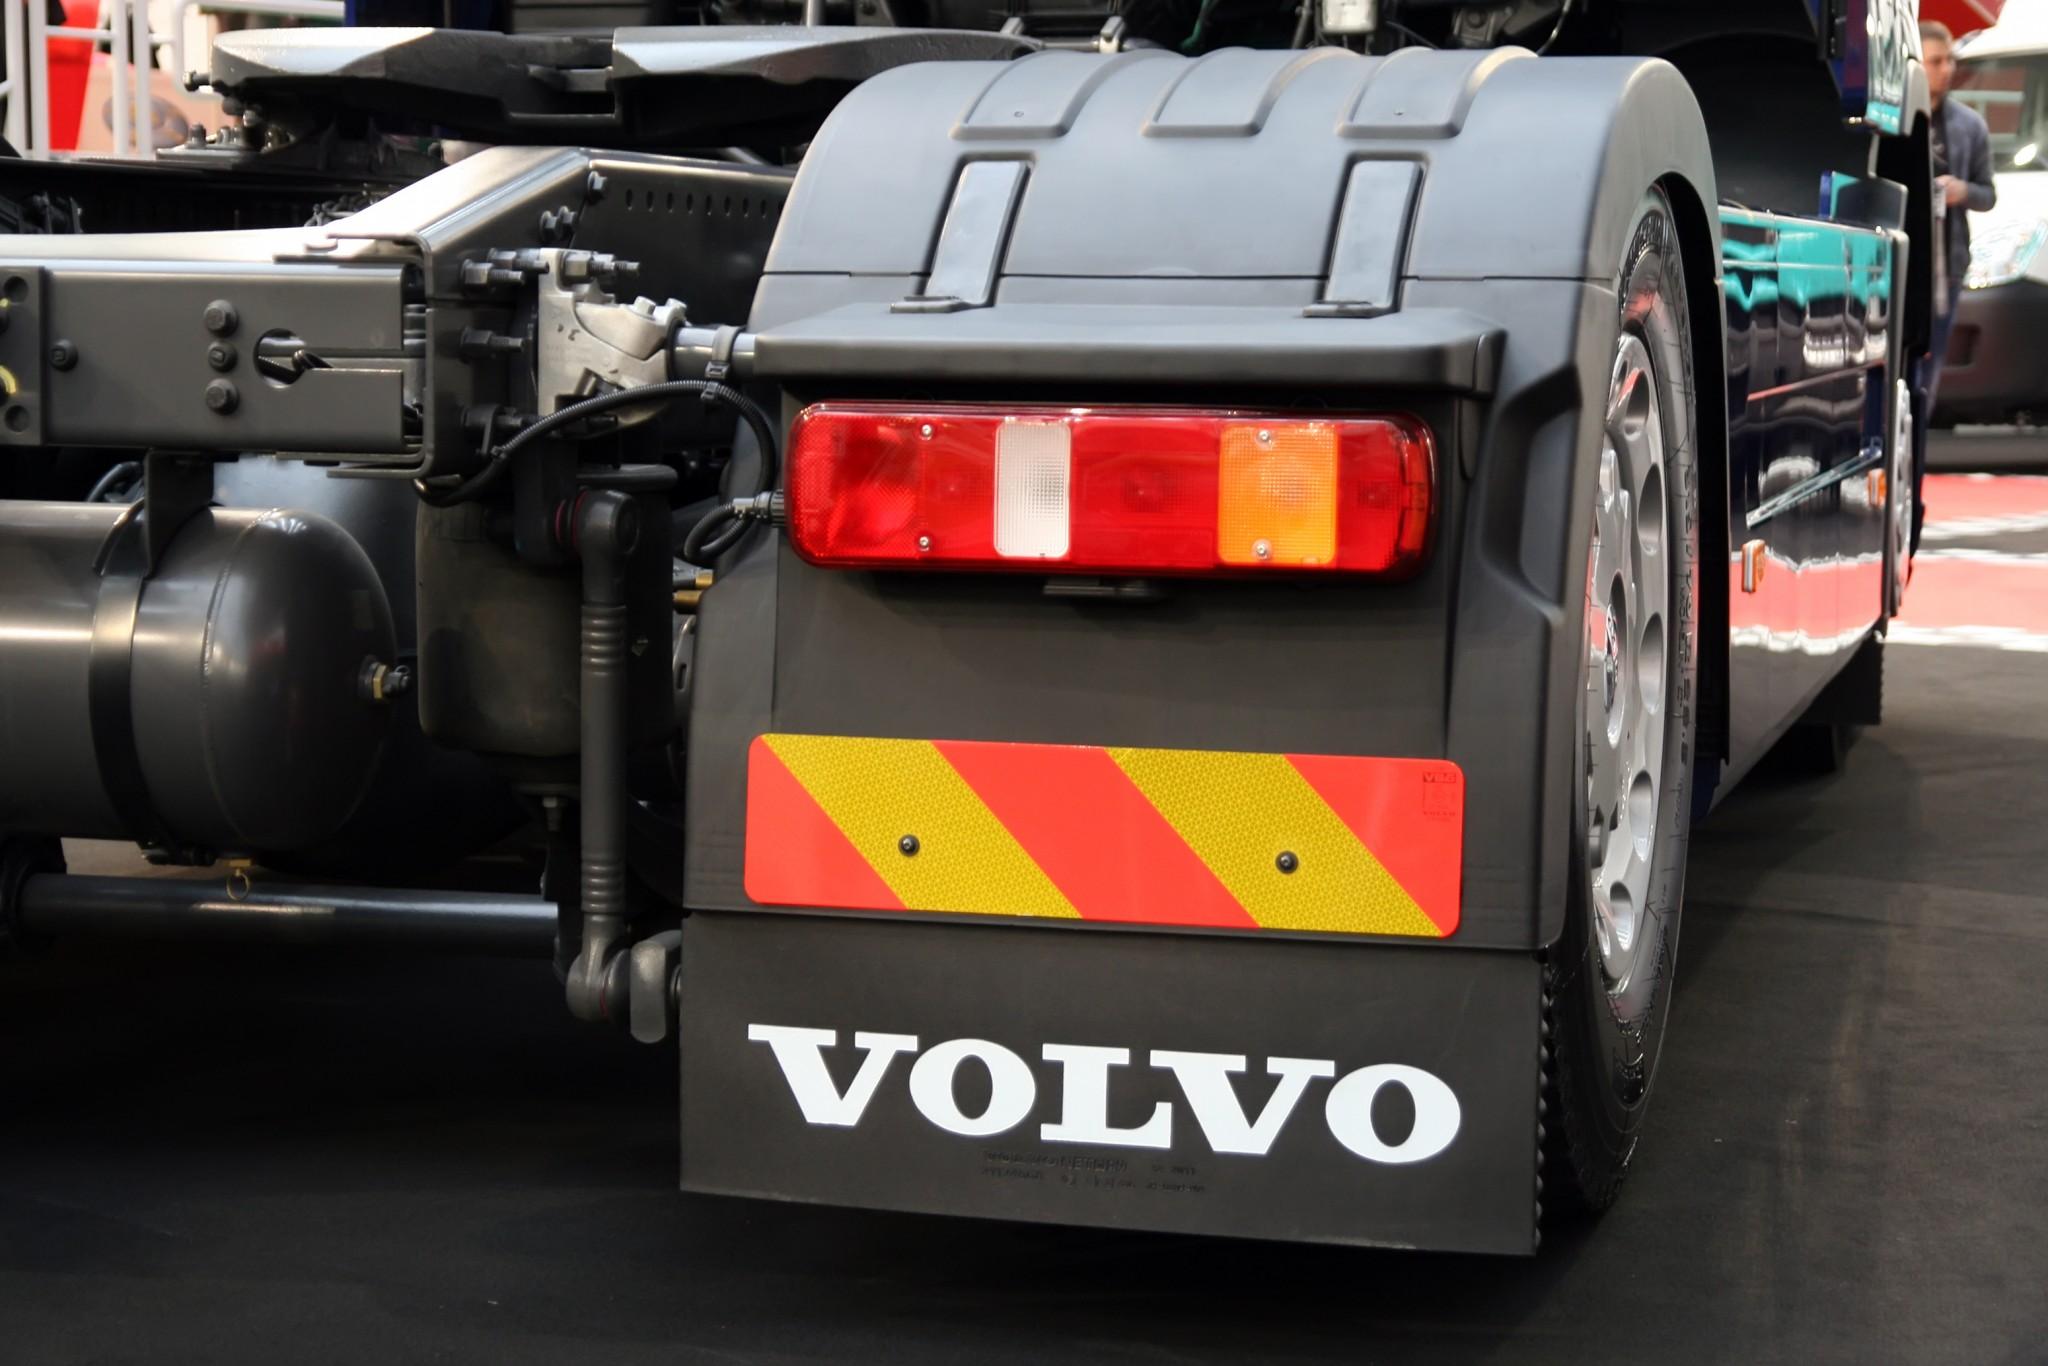 Beeps like backup warnings from trucks create noise pollution negative externalities.